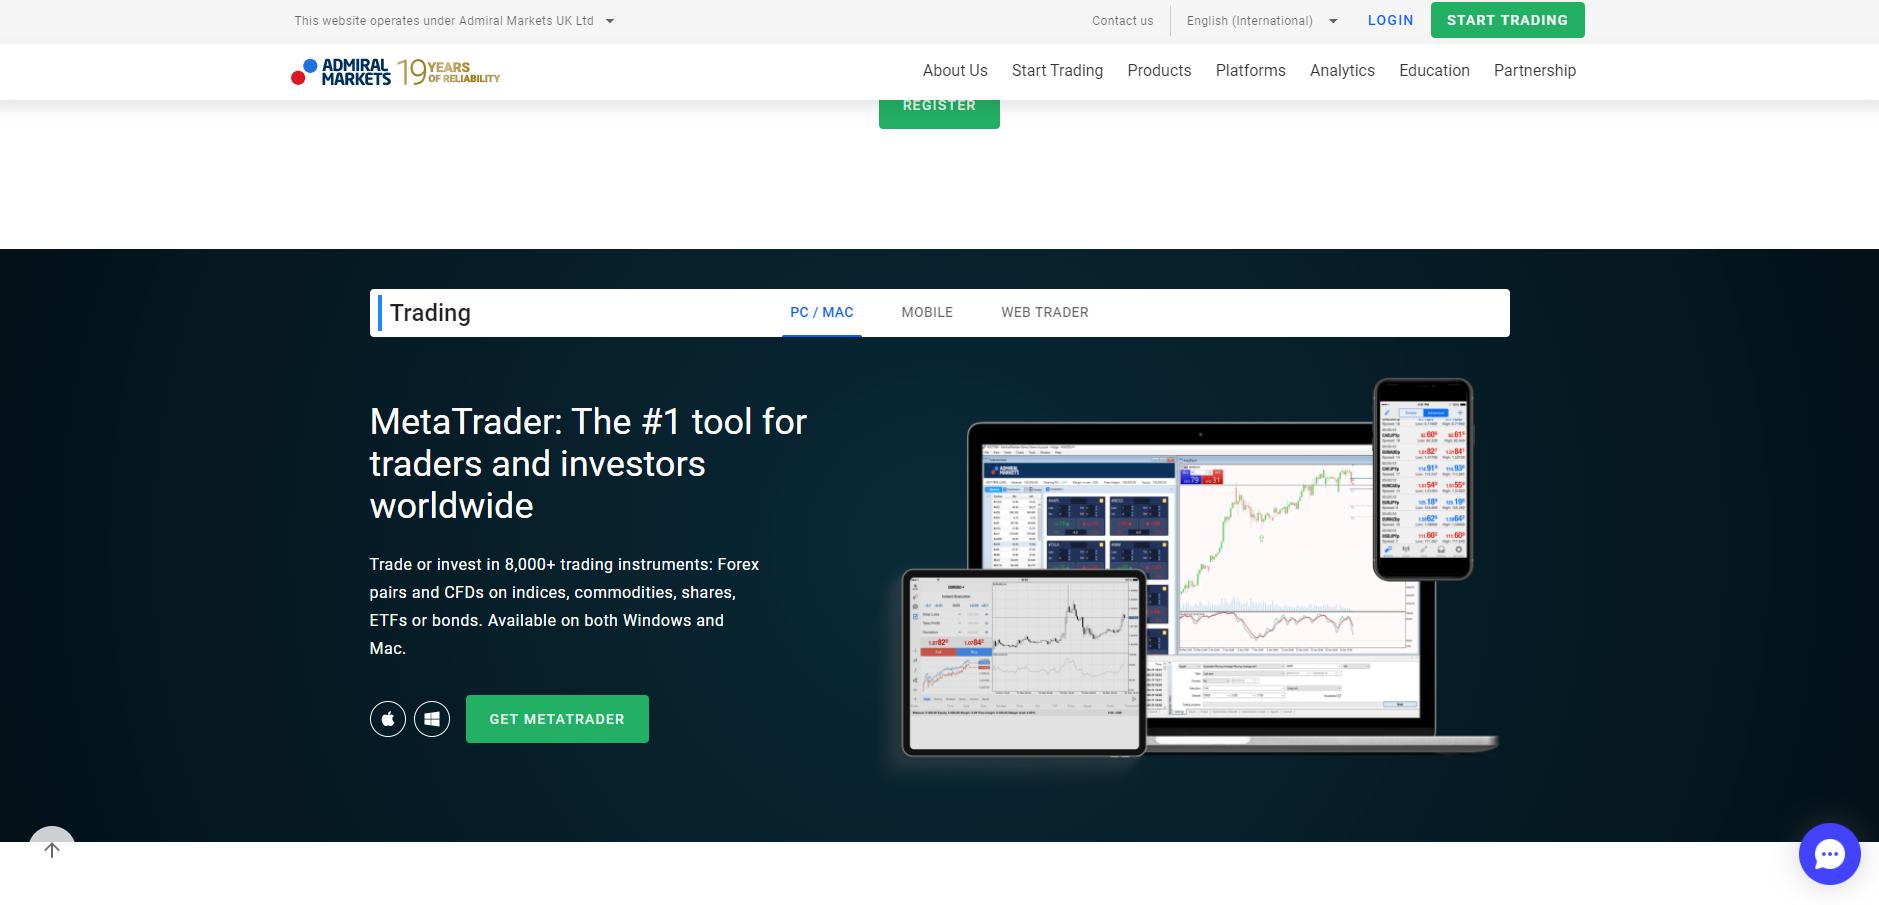 Official website of the forex platform Admiral Markets